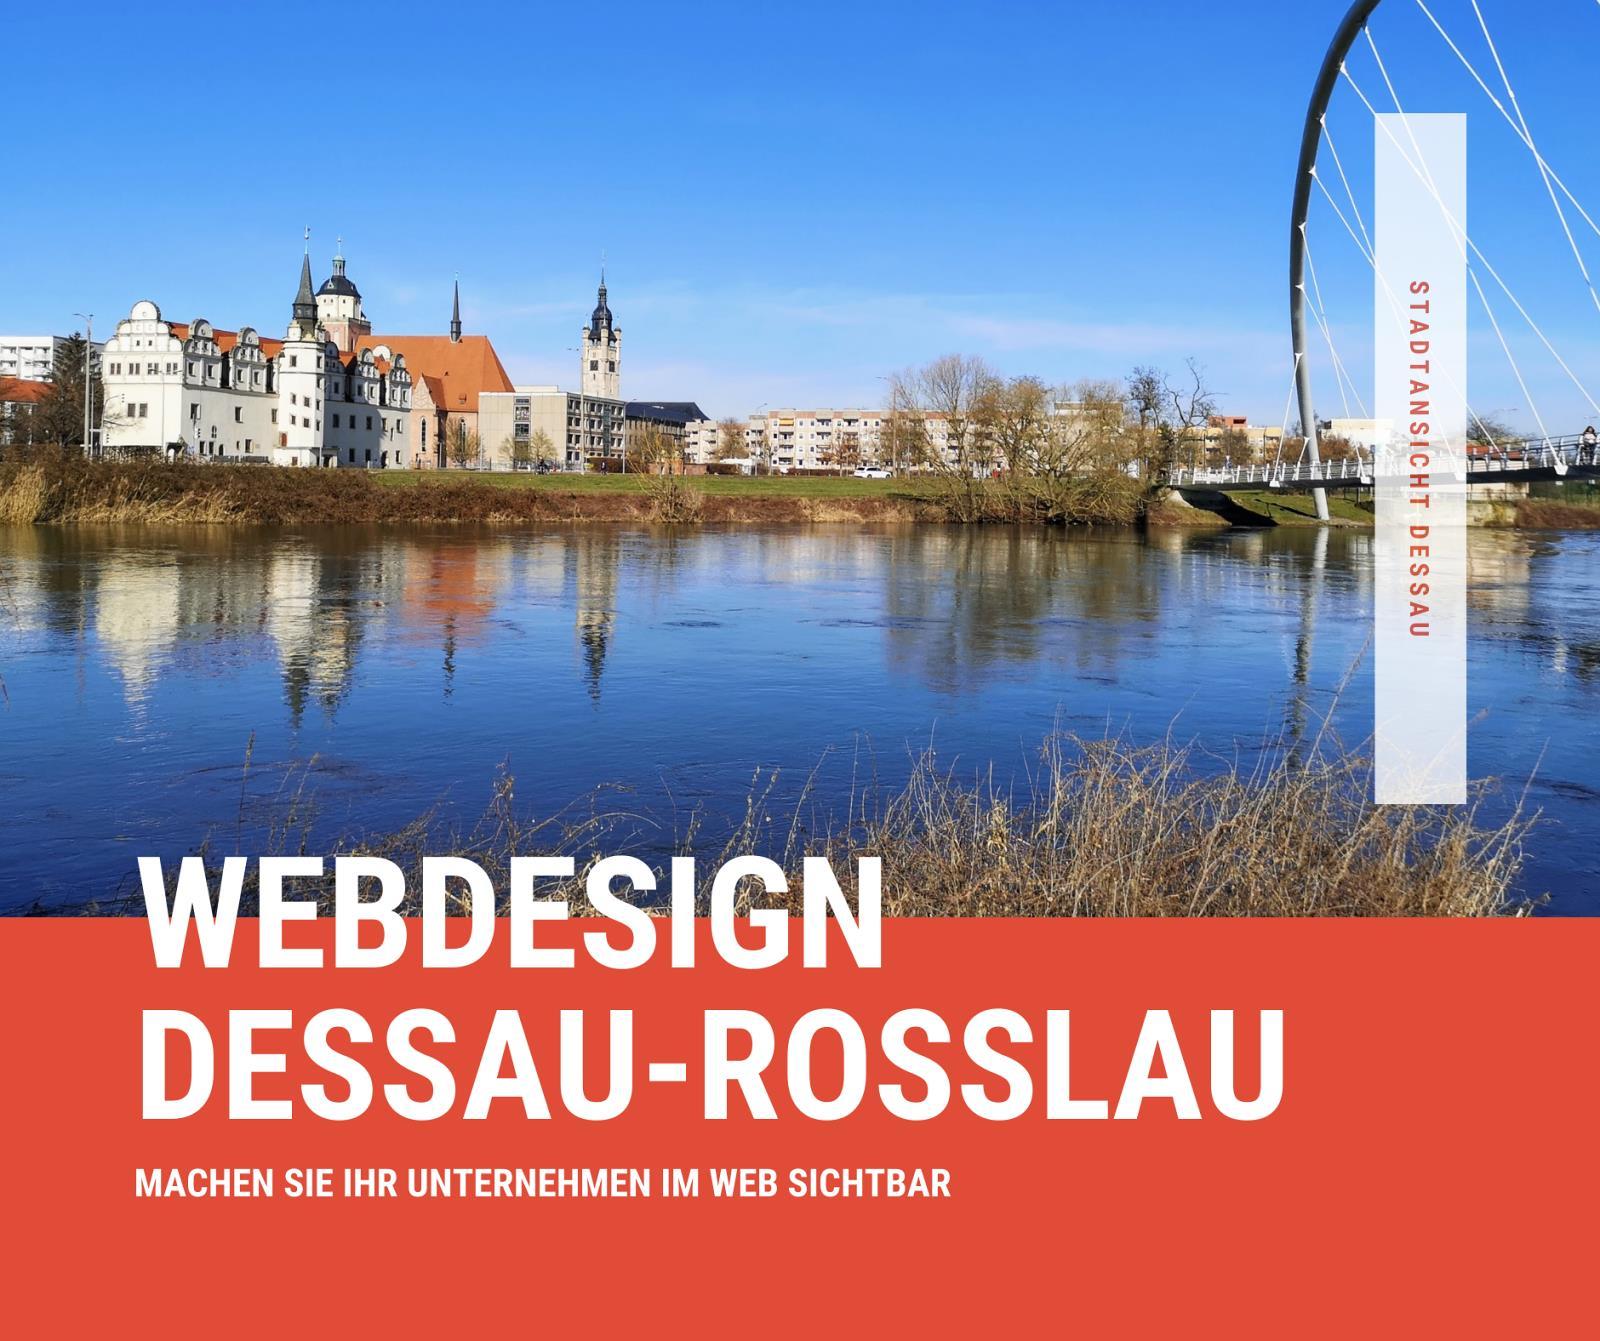 Webdesign Dessau-Roßlau